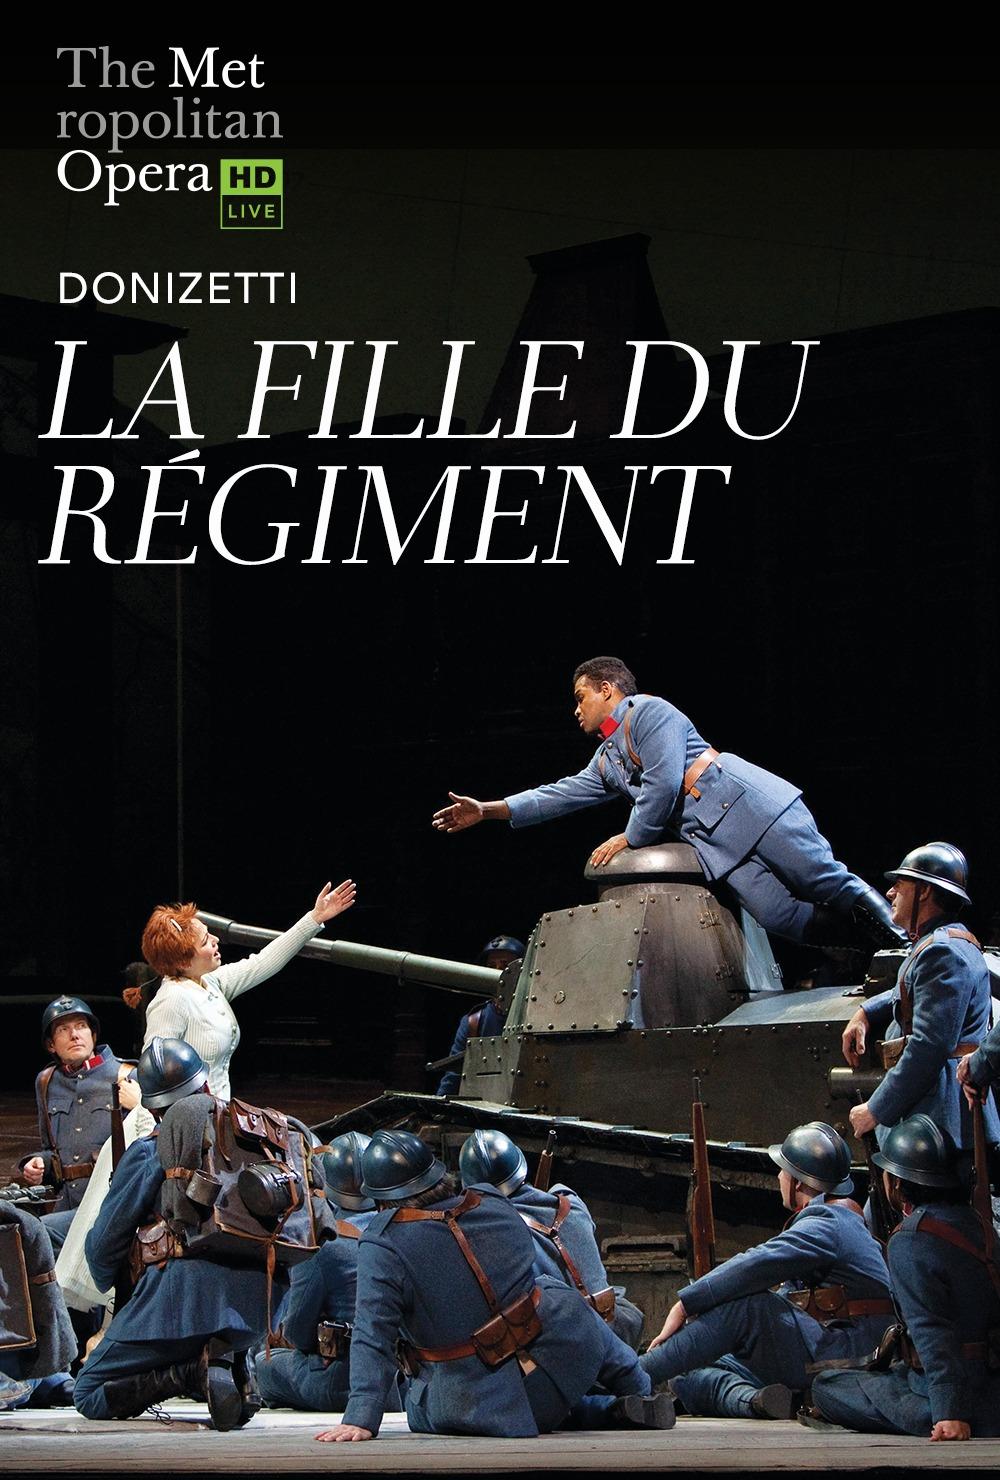 Met-La Fille Du Regiment-Live